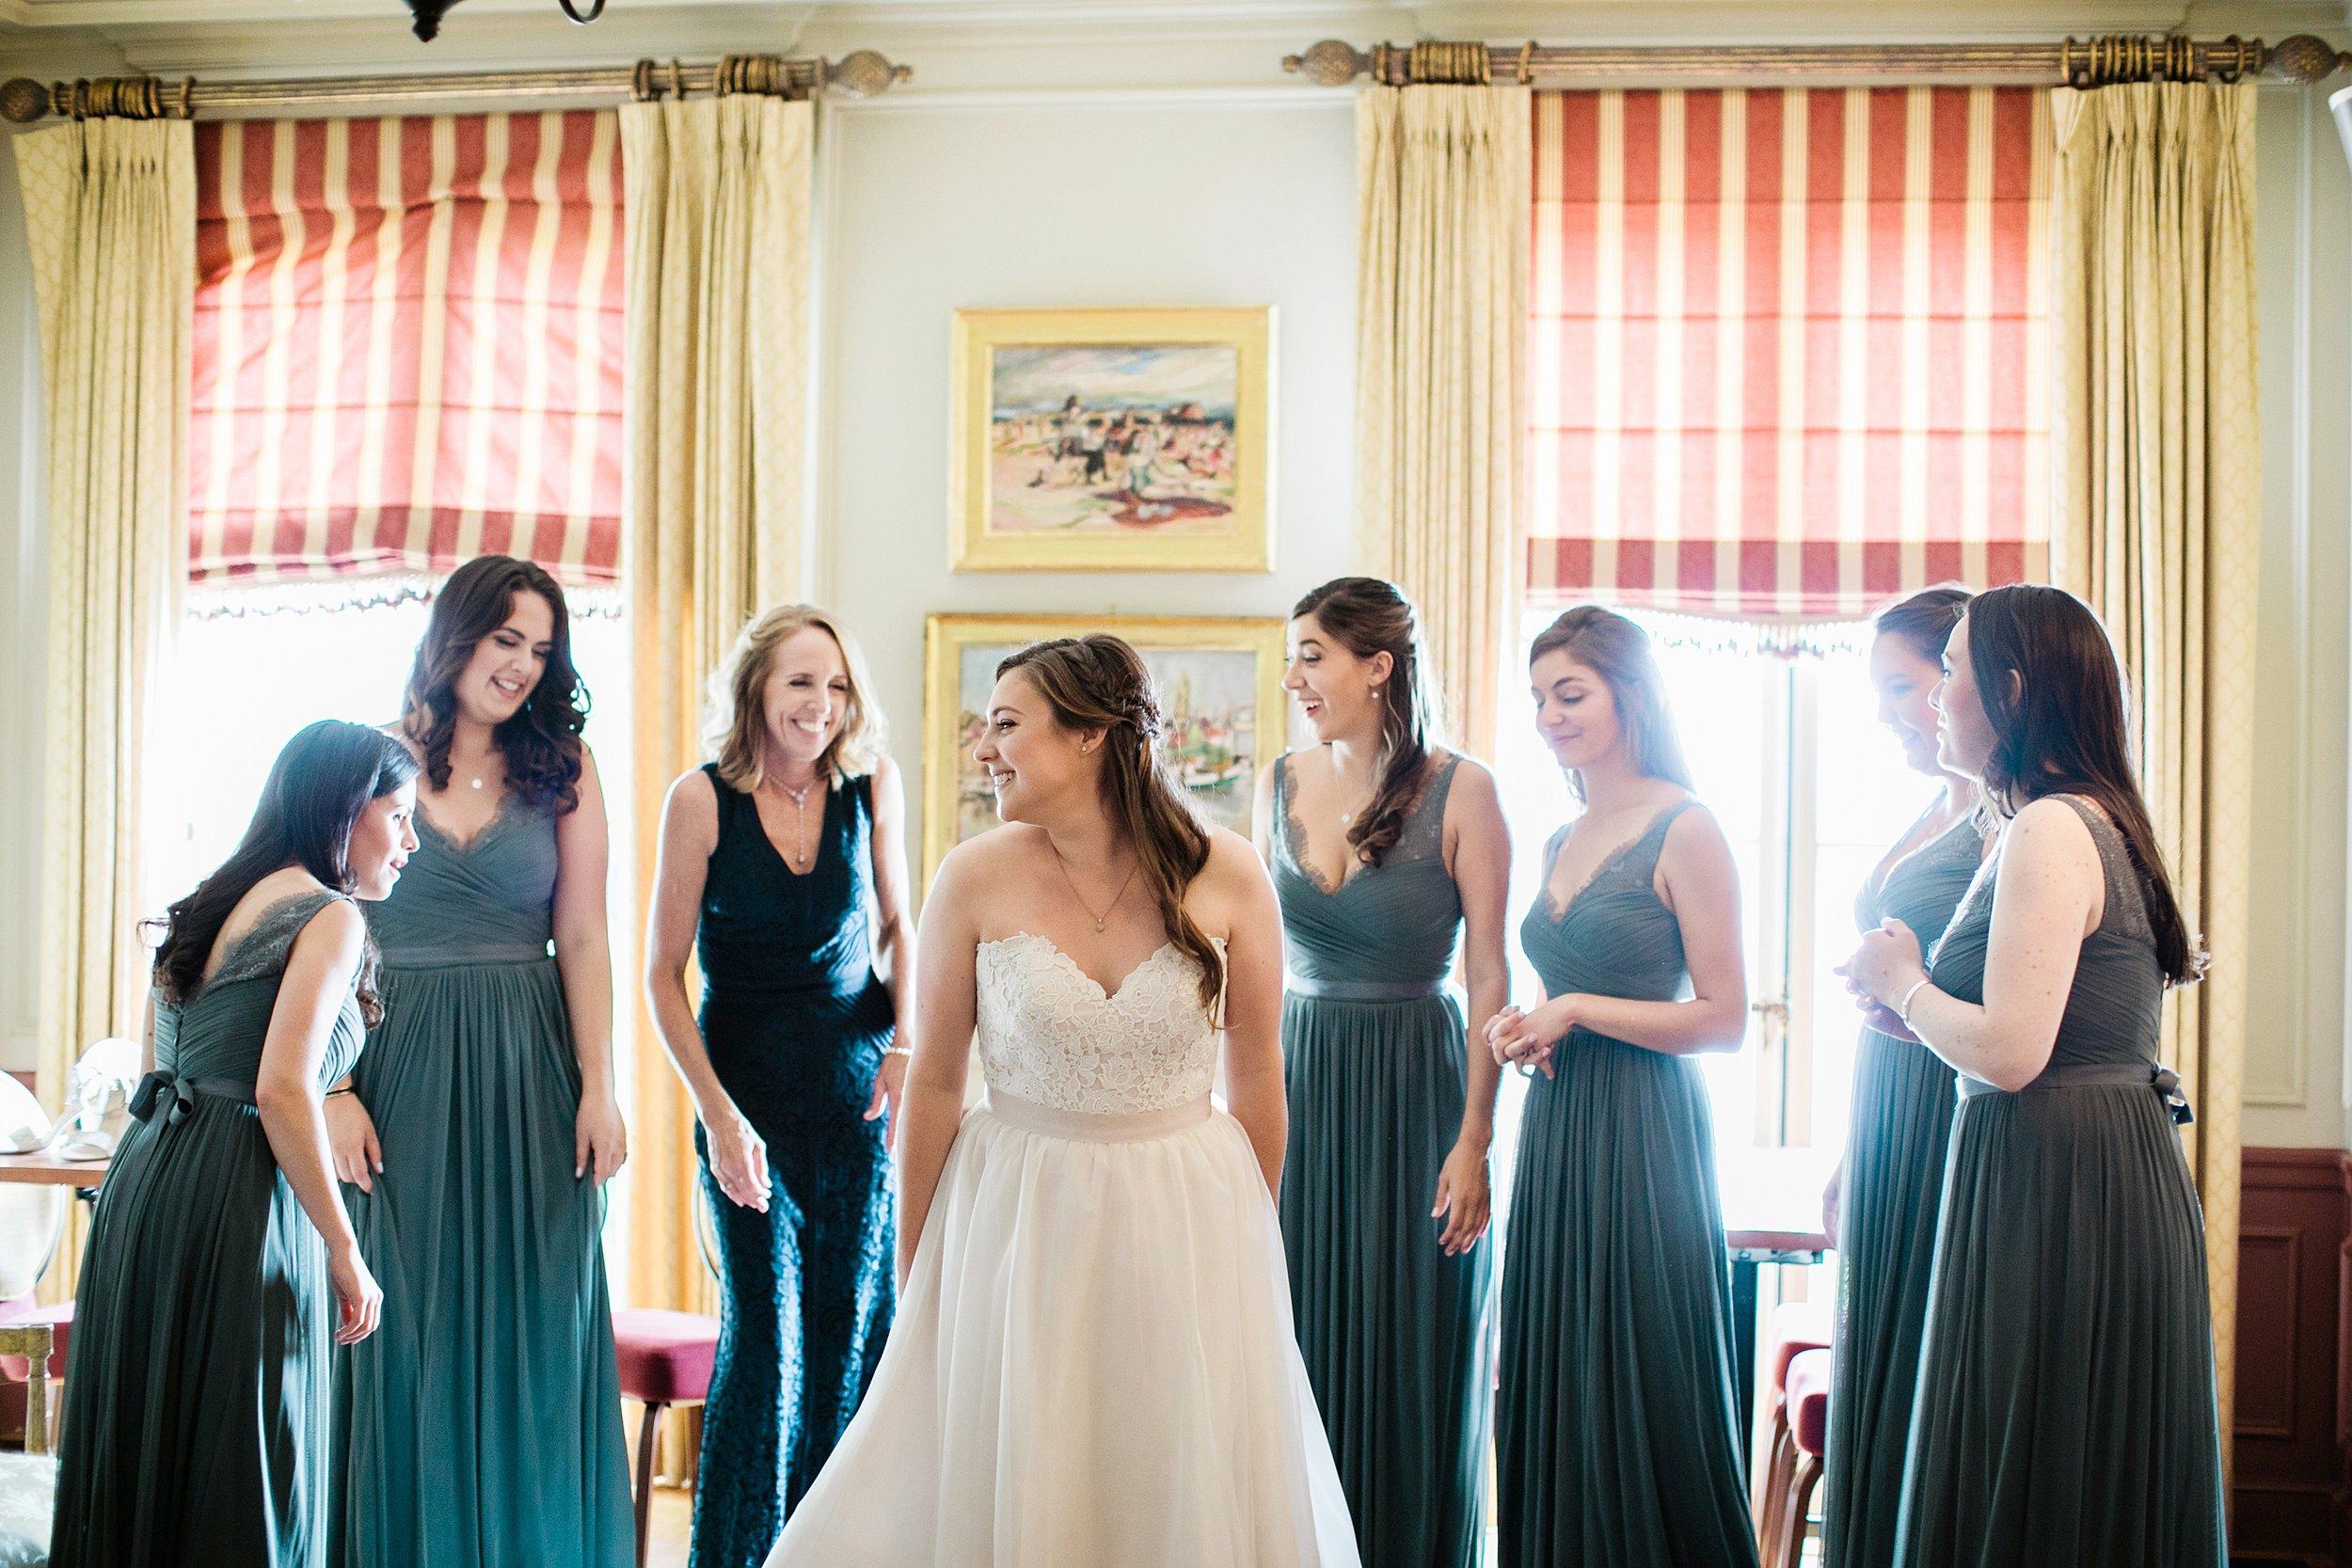 006 los angeles wedding photographer todd danforth photography boston.jpg